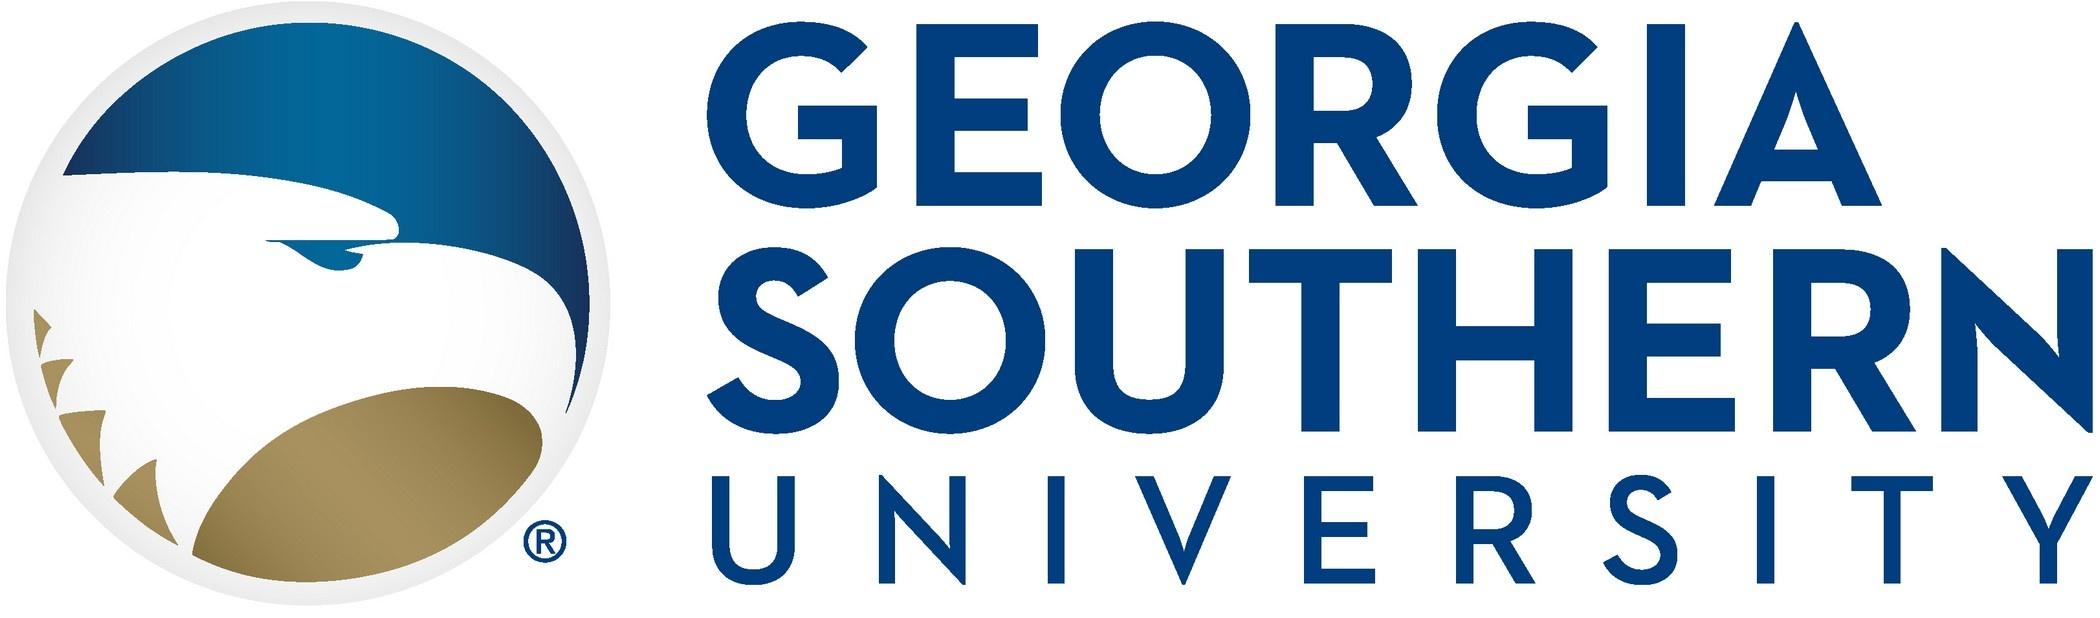 Georgia Southern University Logo.jpg